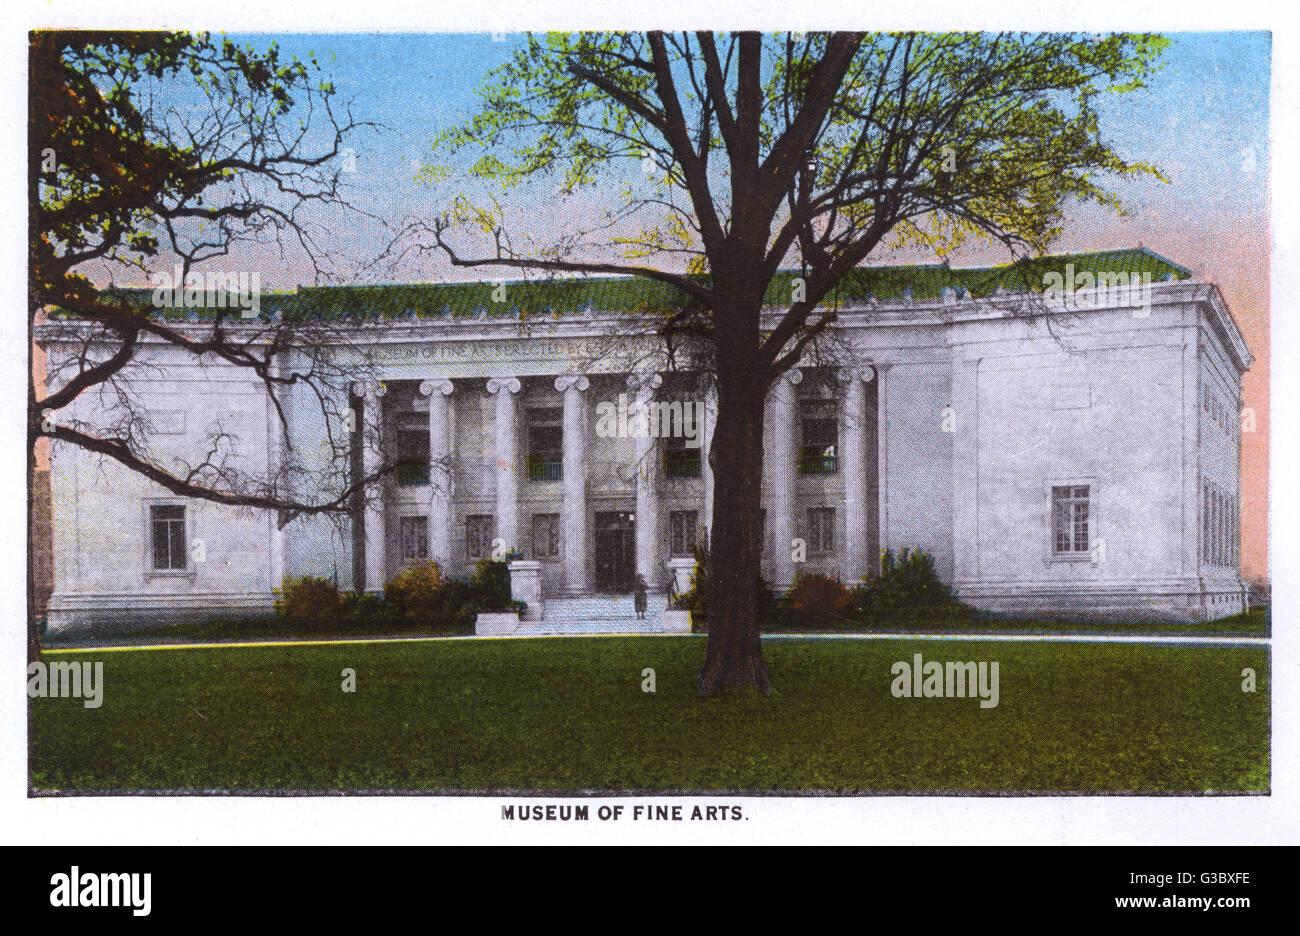 Museum of Fine Arts, Houston, Texas, USA. Date: vers 1928 Photo Stock